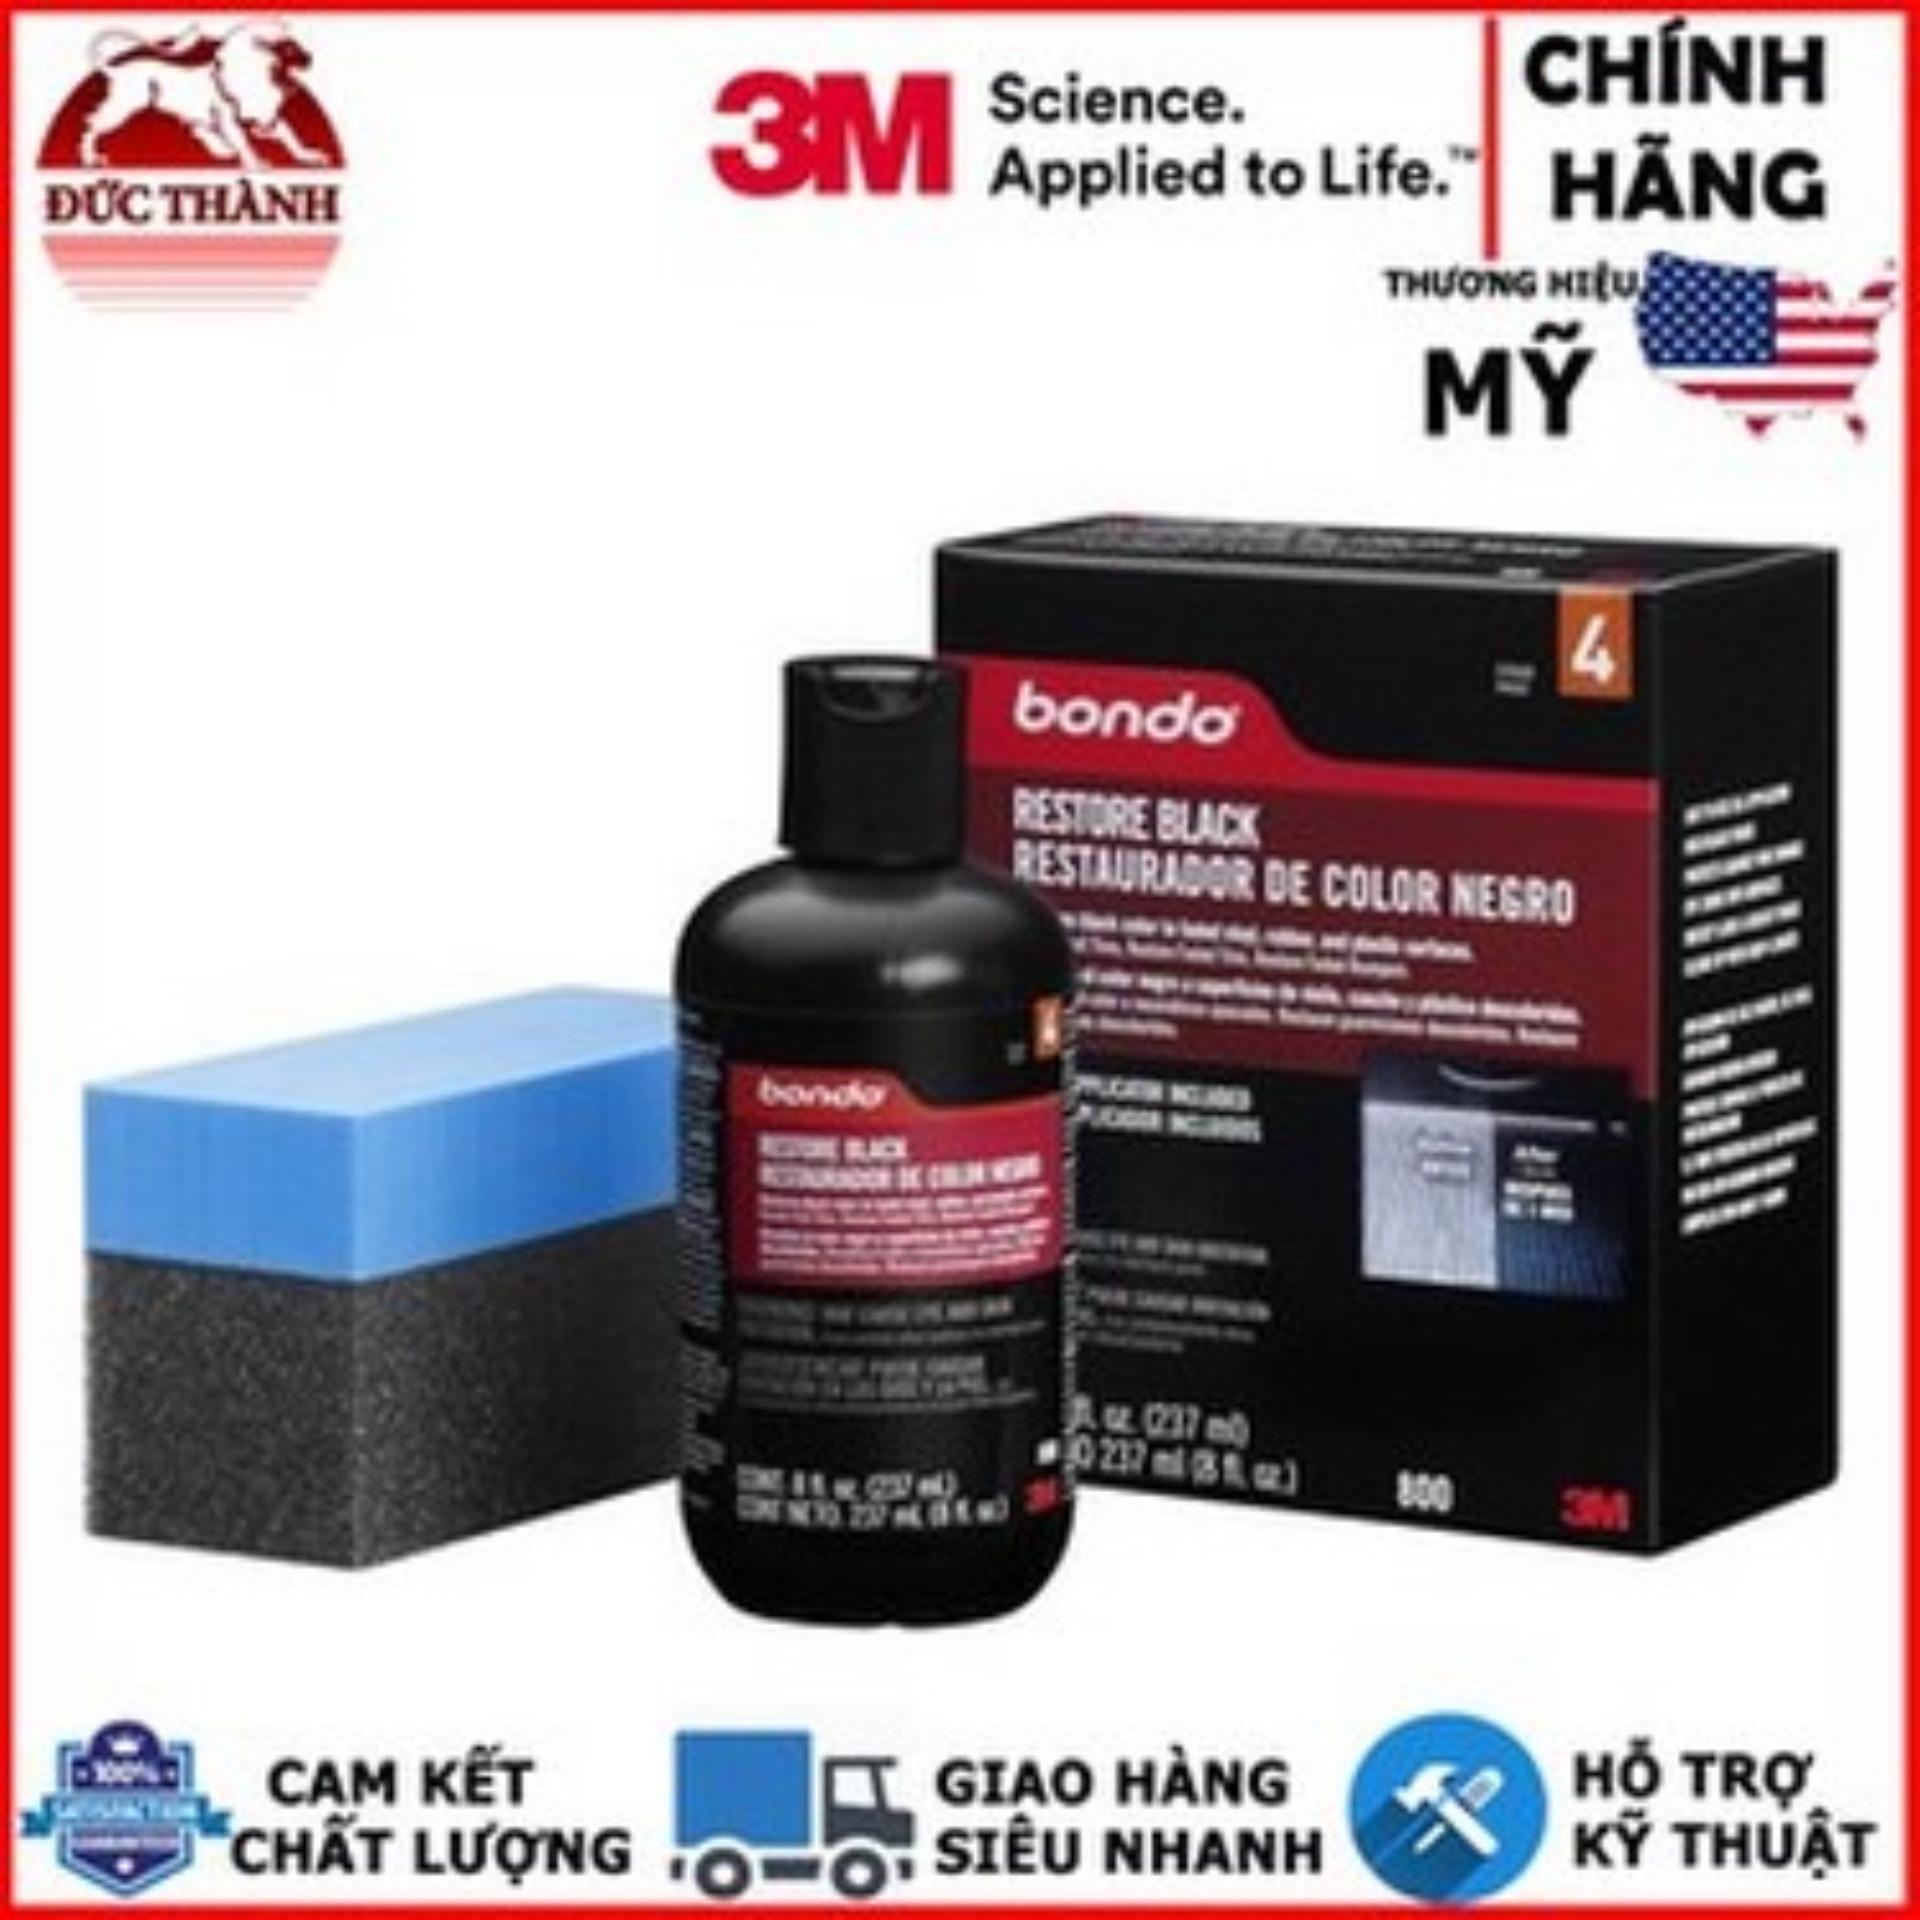 Dung Dịch Phục Hồi Nhựa đen - 3M Bondo Restore Black Restauradoor De Color Negro PN0800 237ml (Đen) Có Giá Tốt